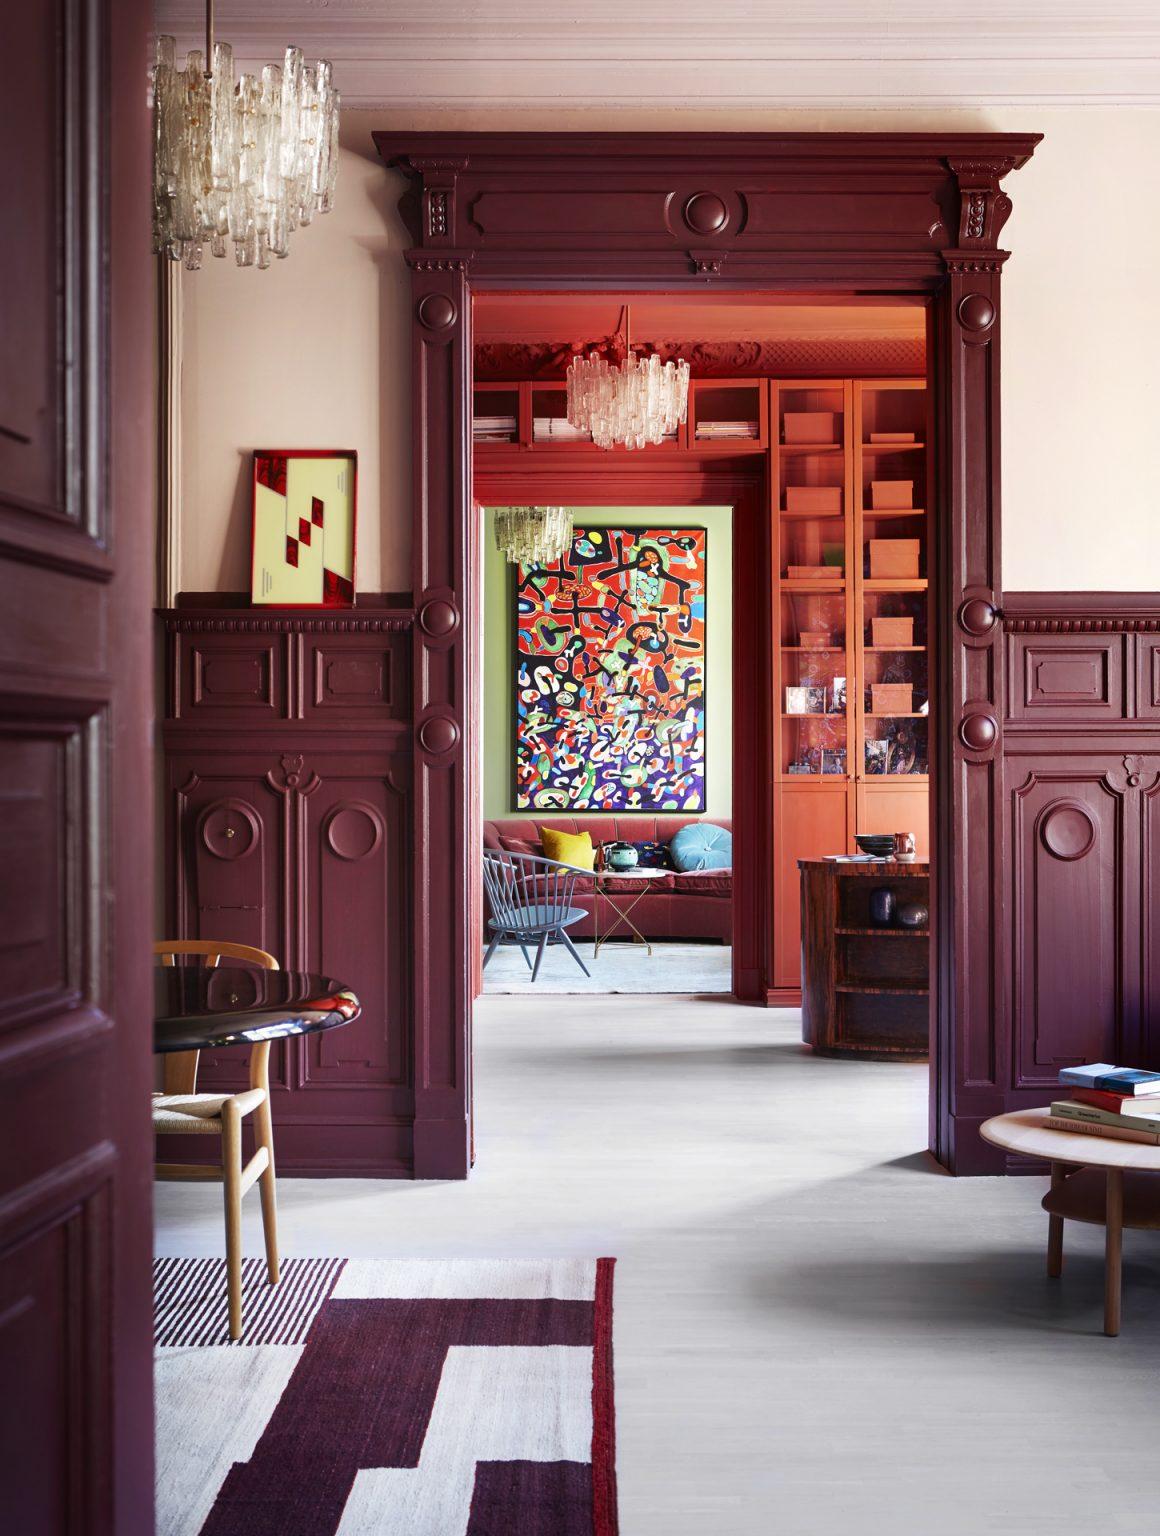 01_pure_original_diningroom_oldwine_panels_skinpowder_wall_oldrose_moldings_office_brownred_wallsceiling_familyroom_landscape_walls